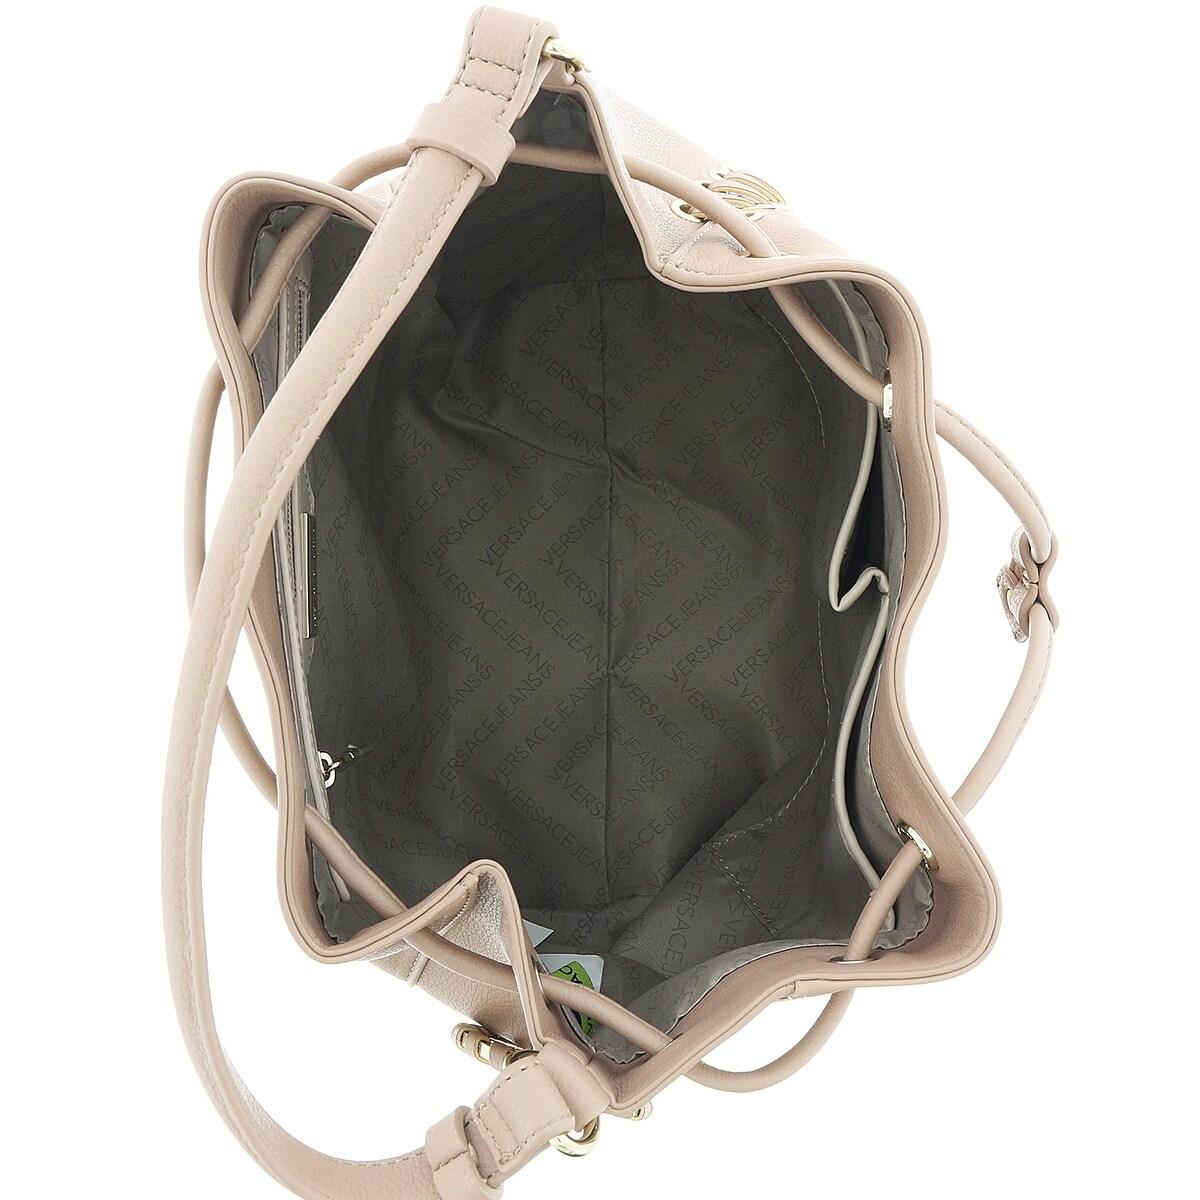 db9c7410d64f Shop Versace EE1VRBBI3 Light Brown Bucket Bag W  detachable strap - Free  Shipping Today - Overstock - 25601825